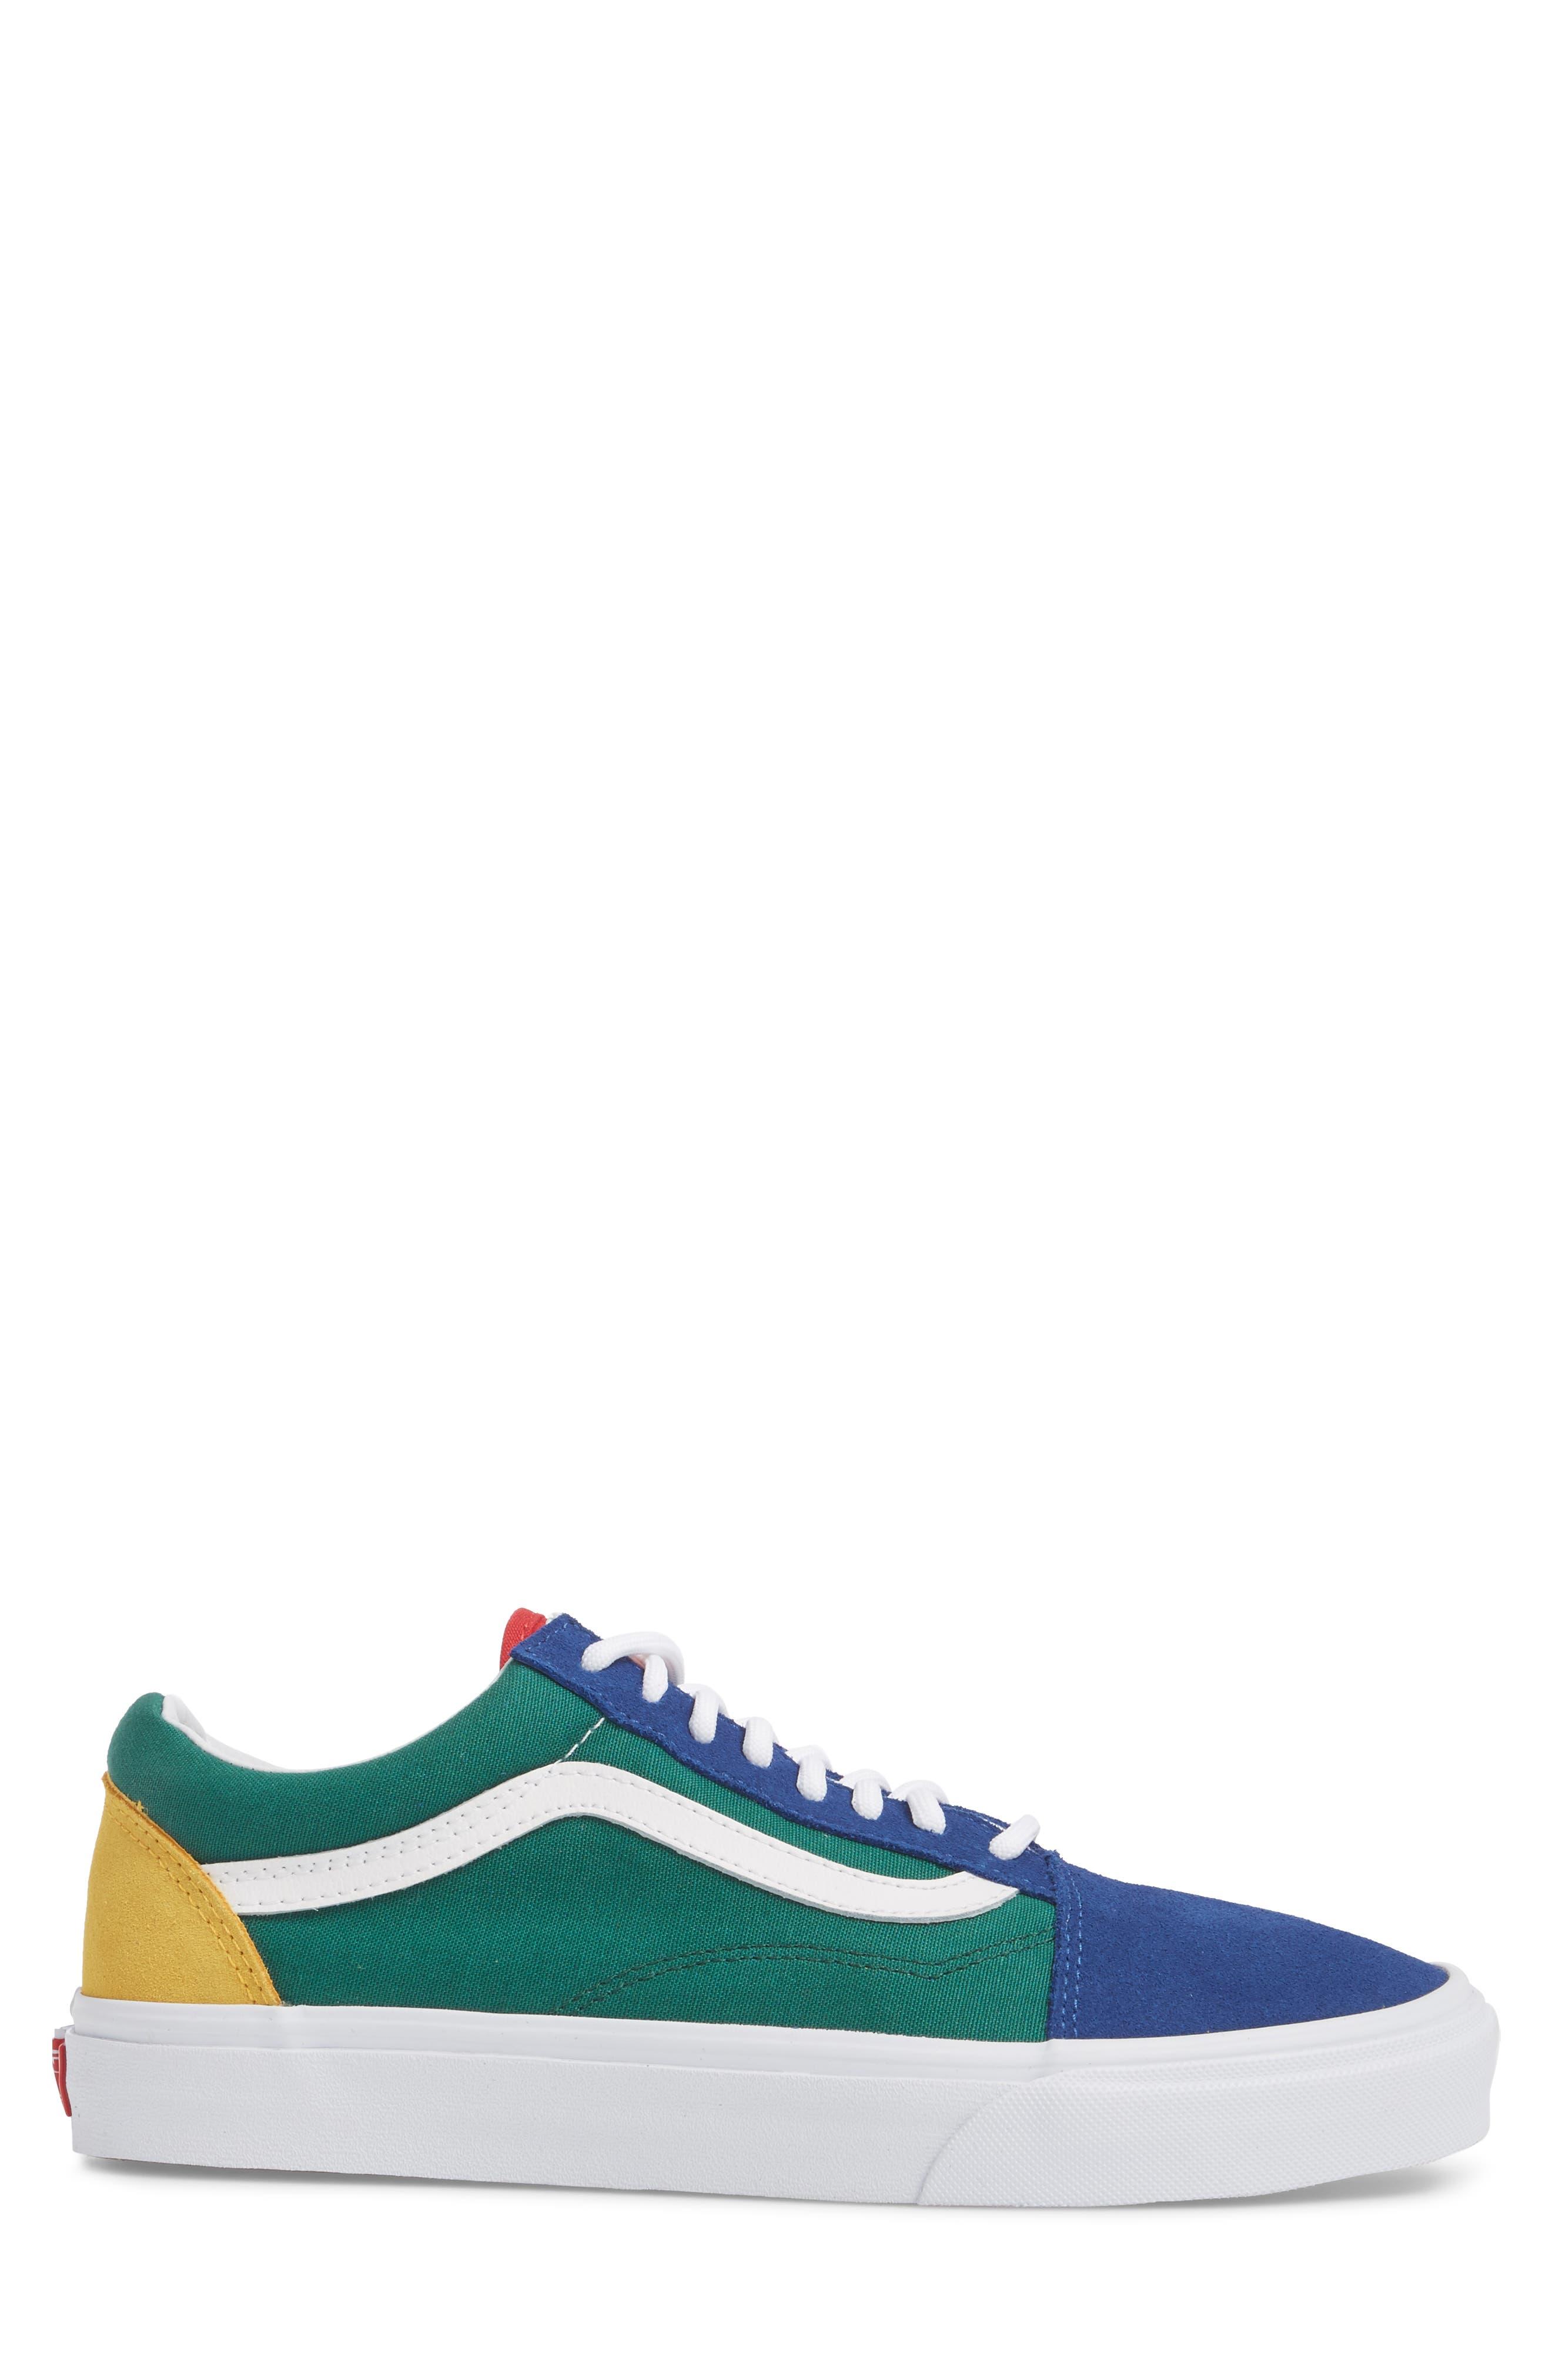 Yacht Club Old Skool Sneaker,                             Alternate thumbnail 3, color,                             300